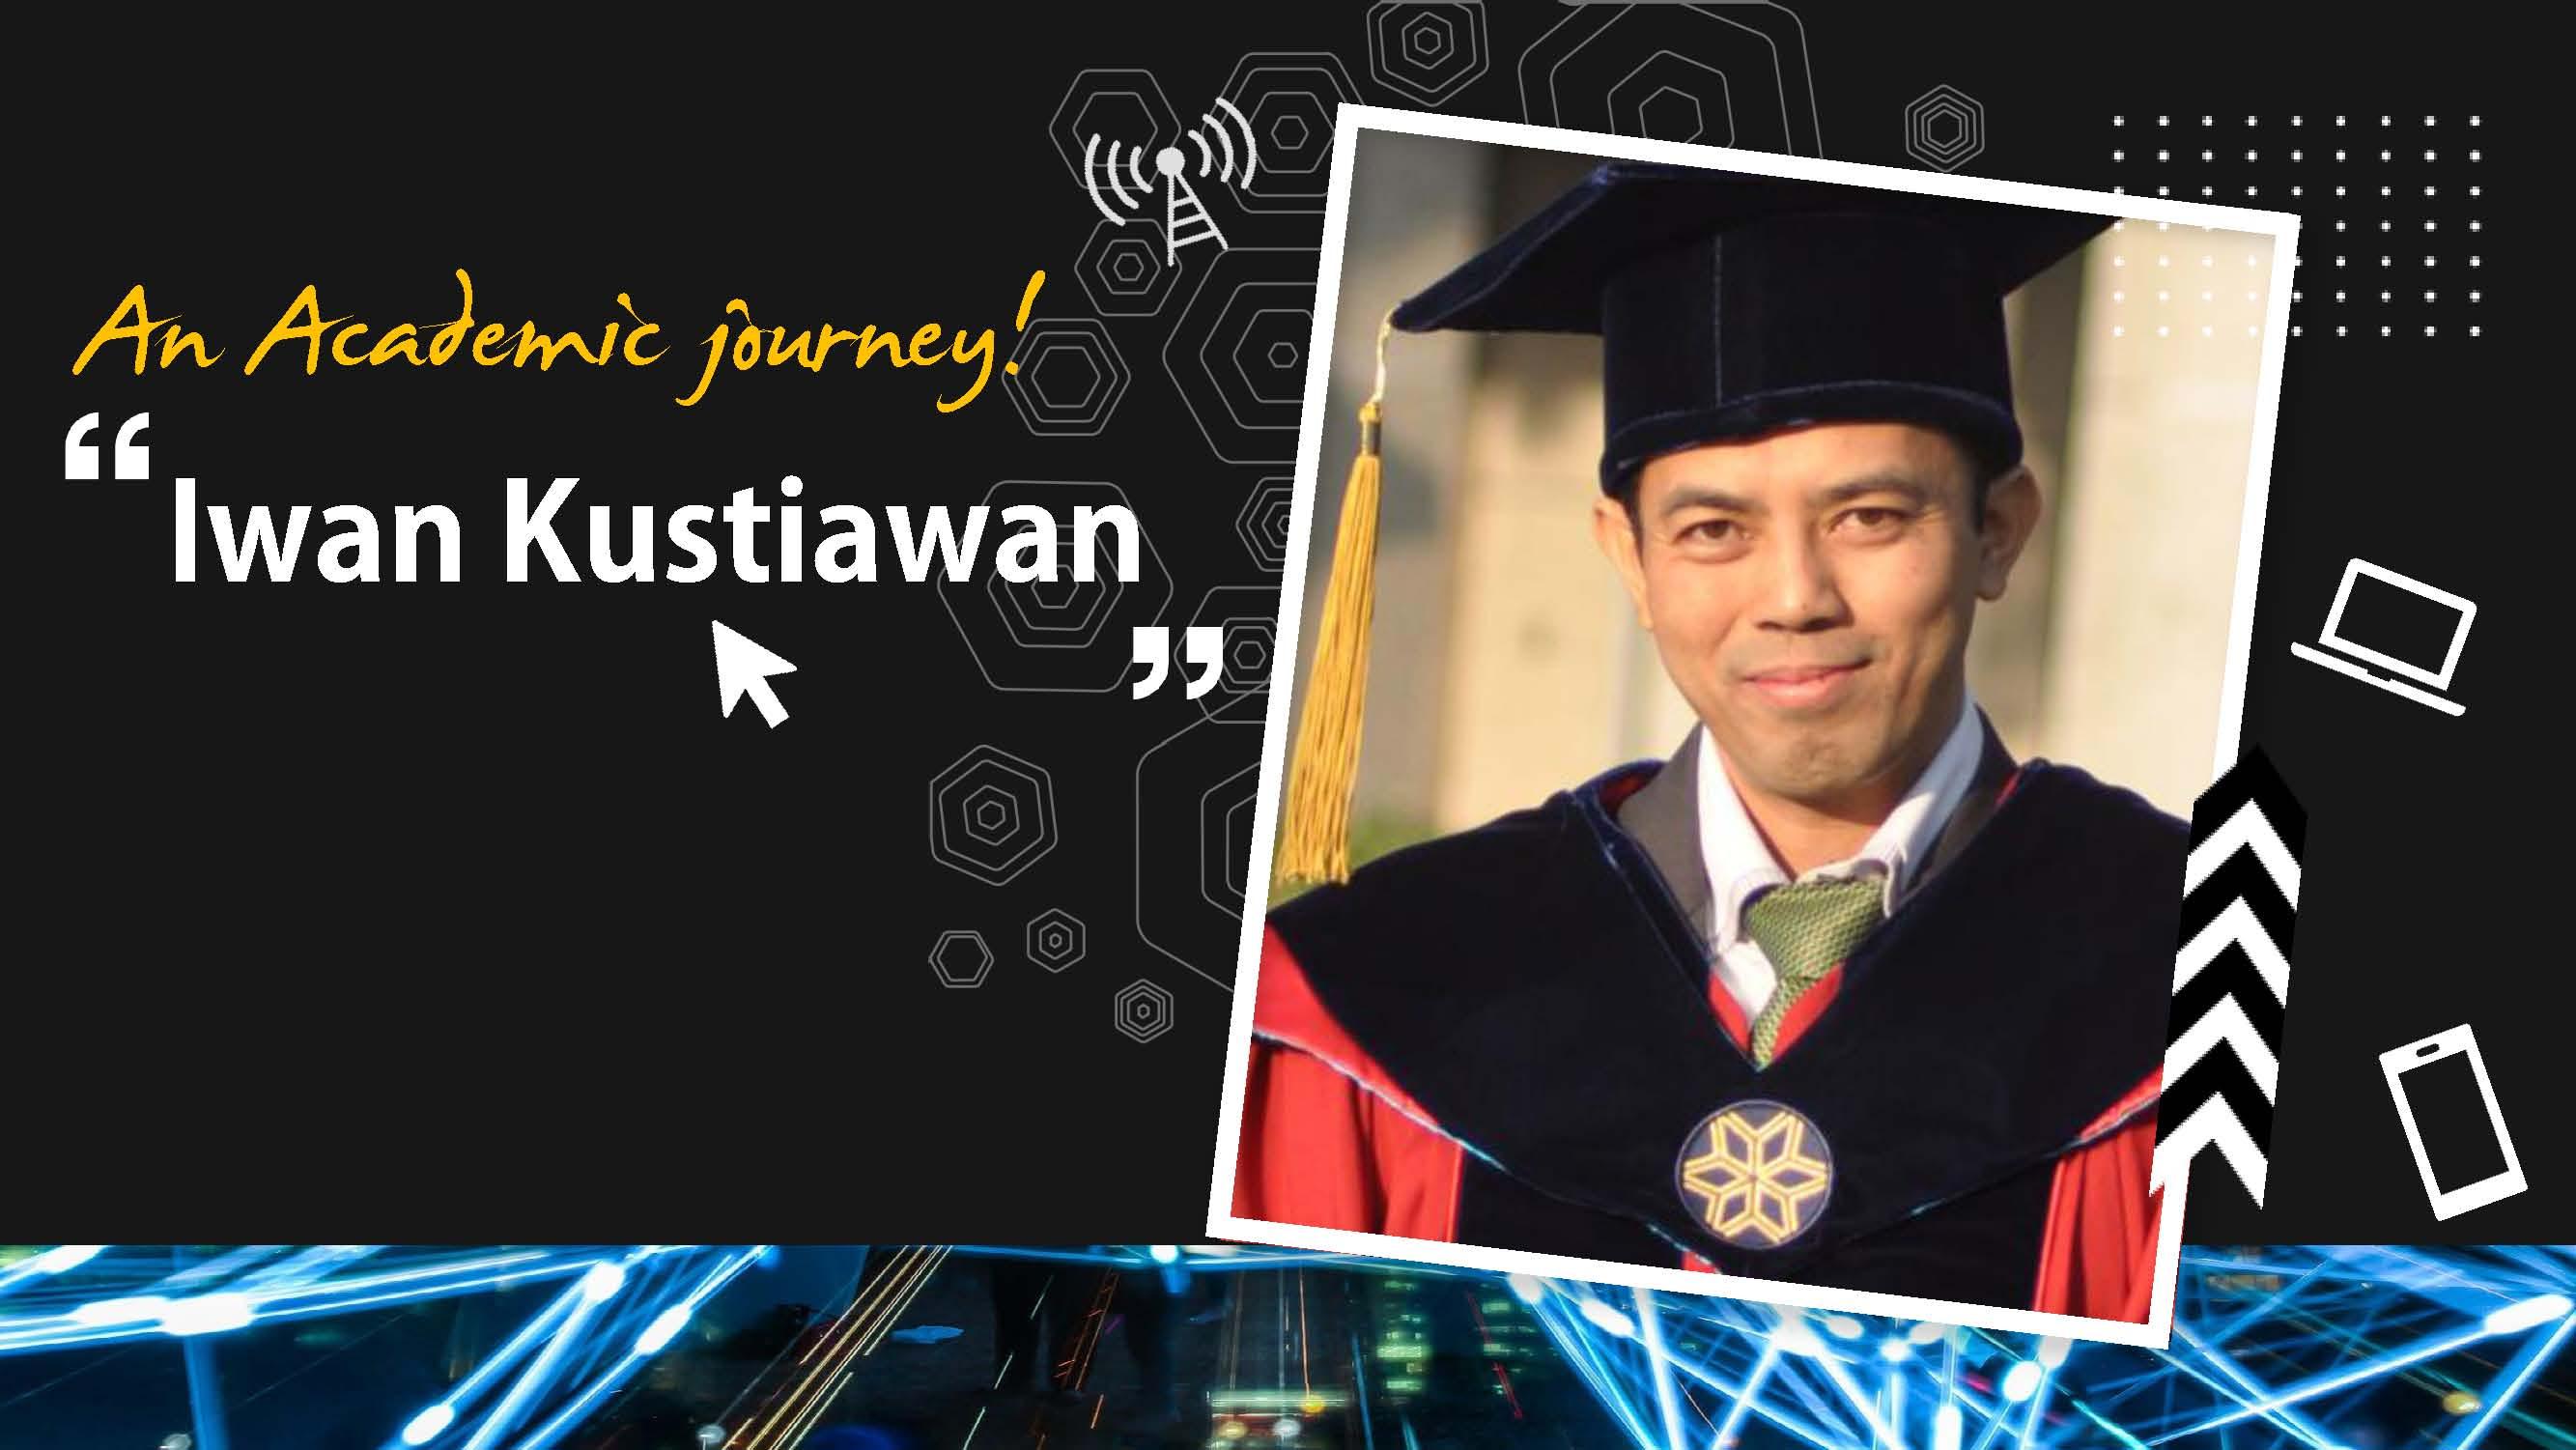 An Academic journey of Iwan Kustiawan